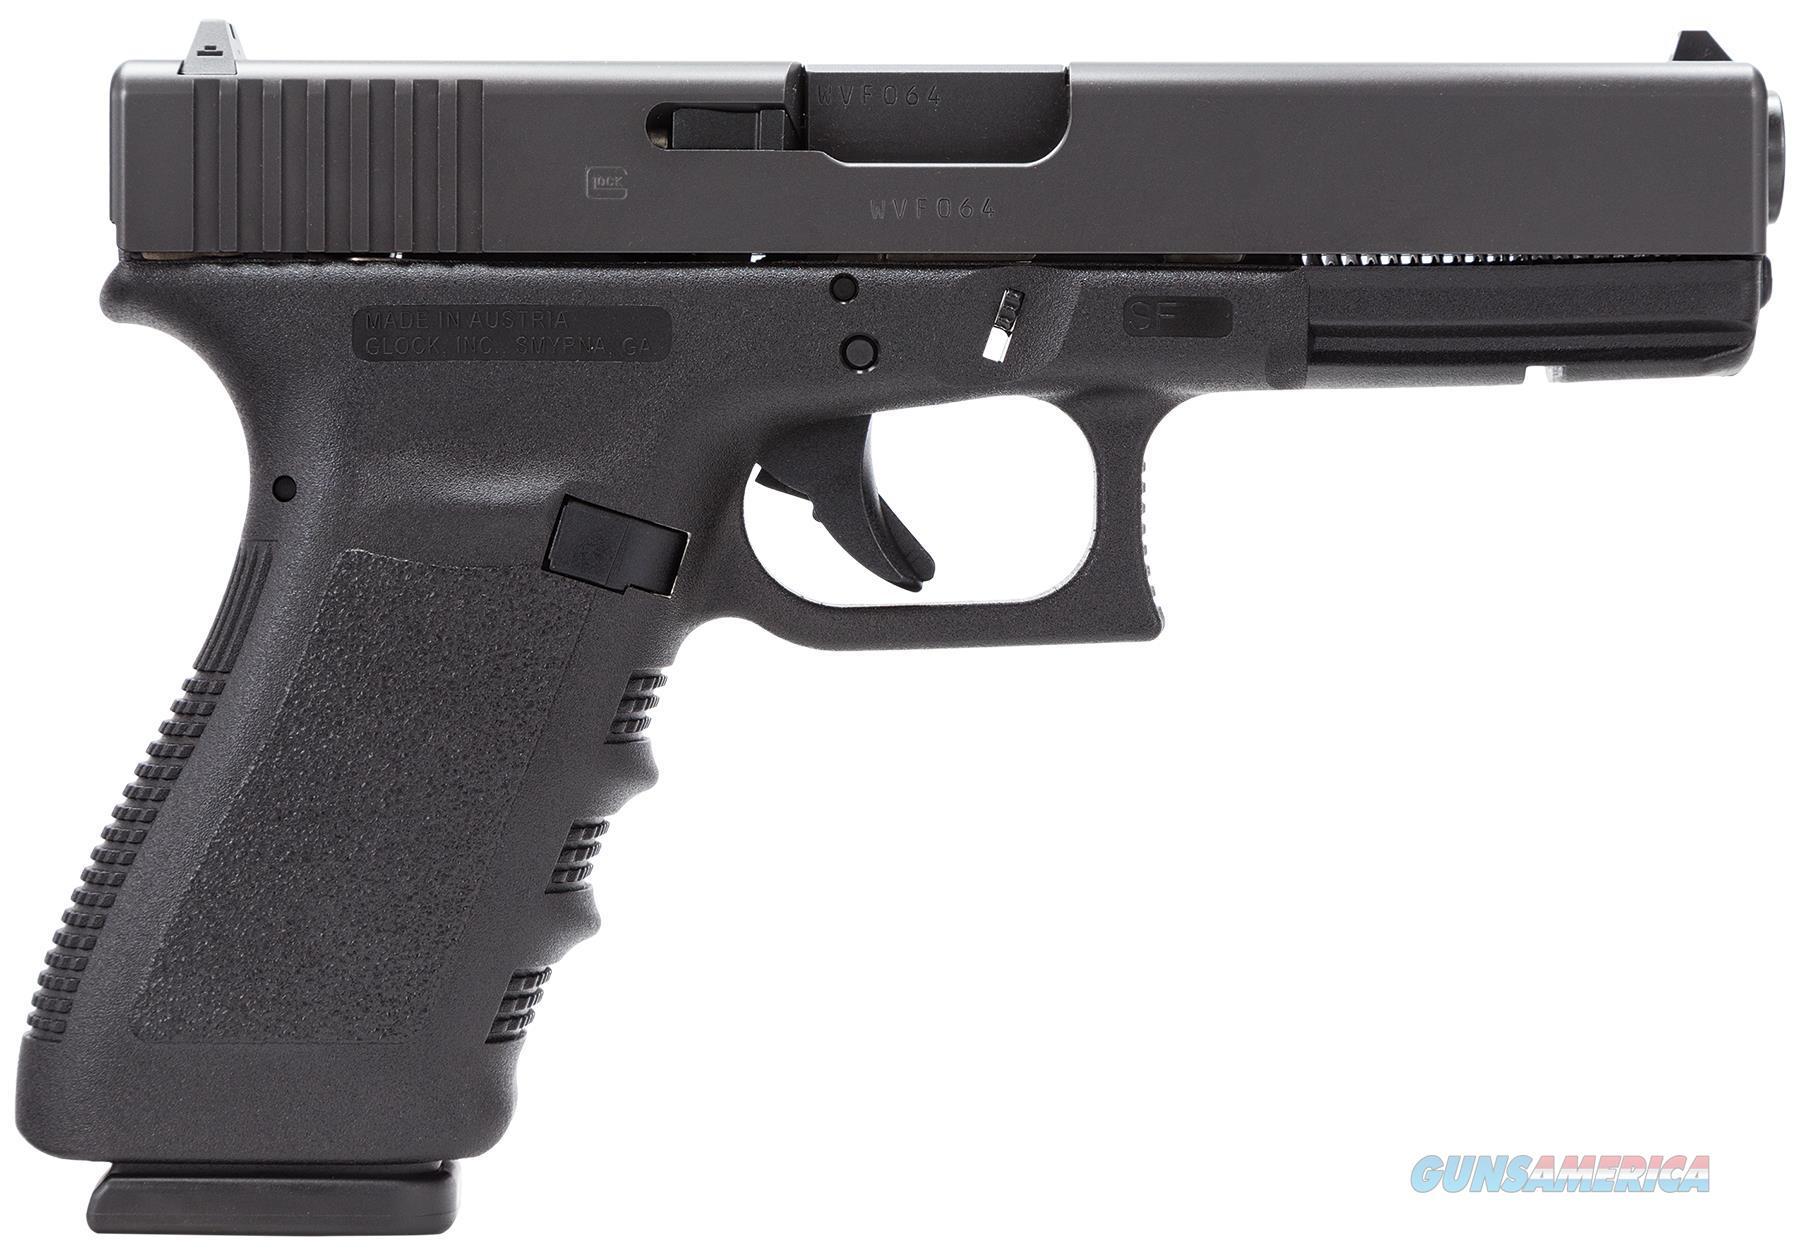 "Glock Pf2150203 G21sfrl G21 Short Frame 45Acp 4.6"" 13+1 Fs Poly Grip/Frm Blk PF2150203  Guns > Pistols > G Misc Pistols"